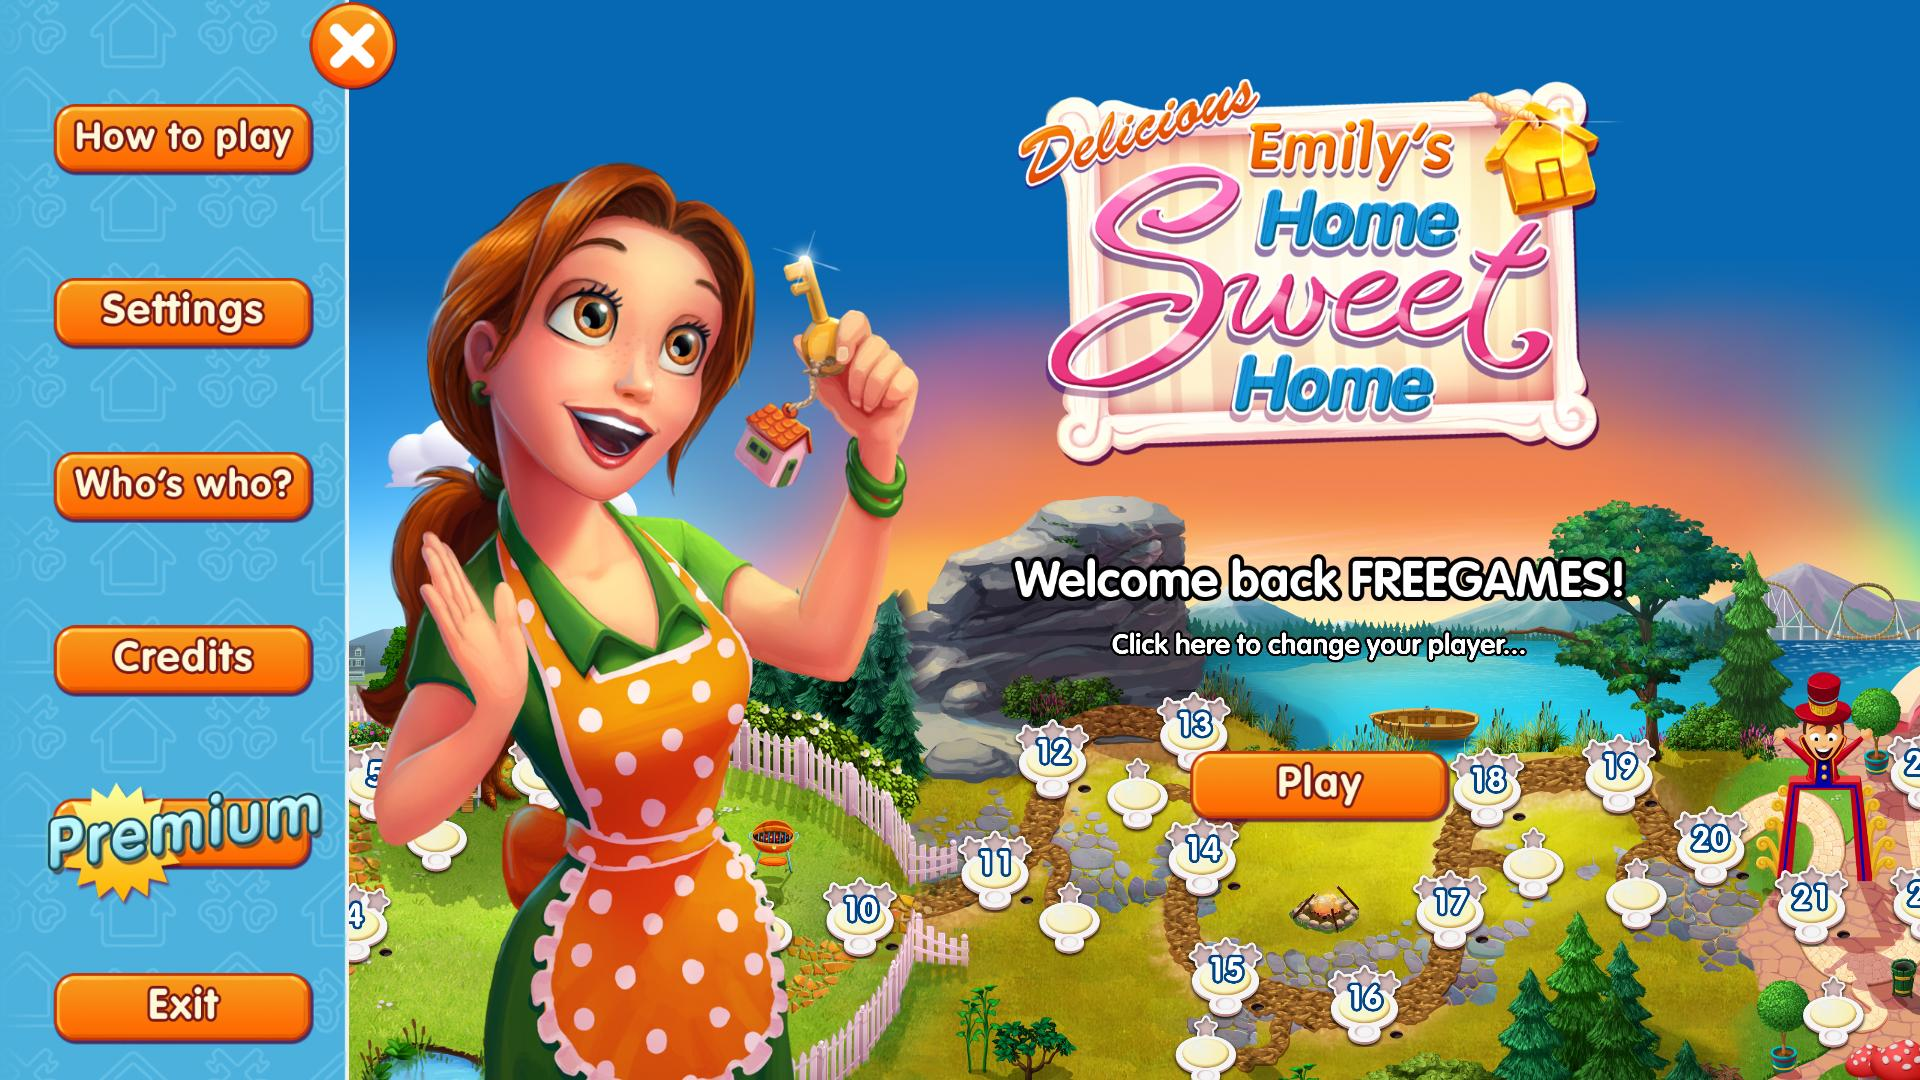 Delicious 11. Emily's Дом, милый дом. Коллекционное издание | Delicious 11: Emily's Home Sweet Home CE (En)